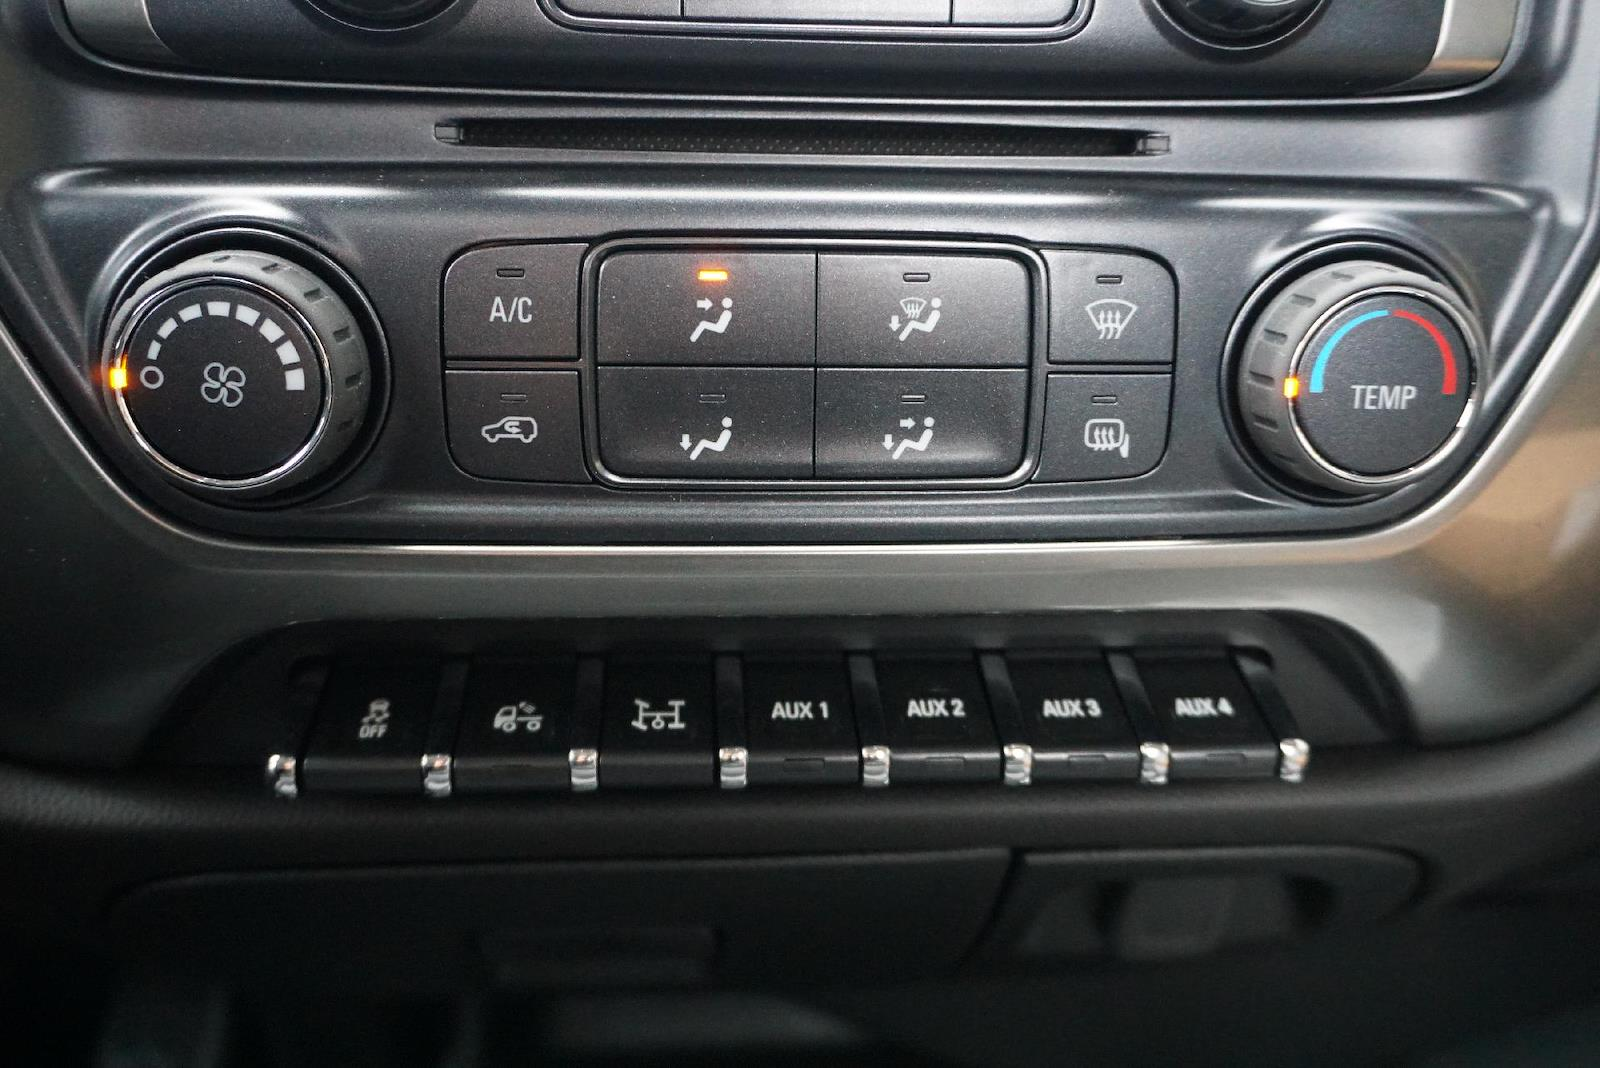 2019 Chevrolet Silverado 5500 Regular Cab DRW 4x2, Cab Chassis #91052 - photo 18